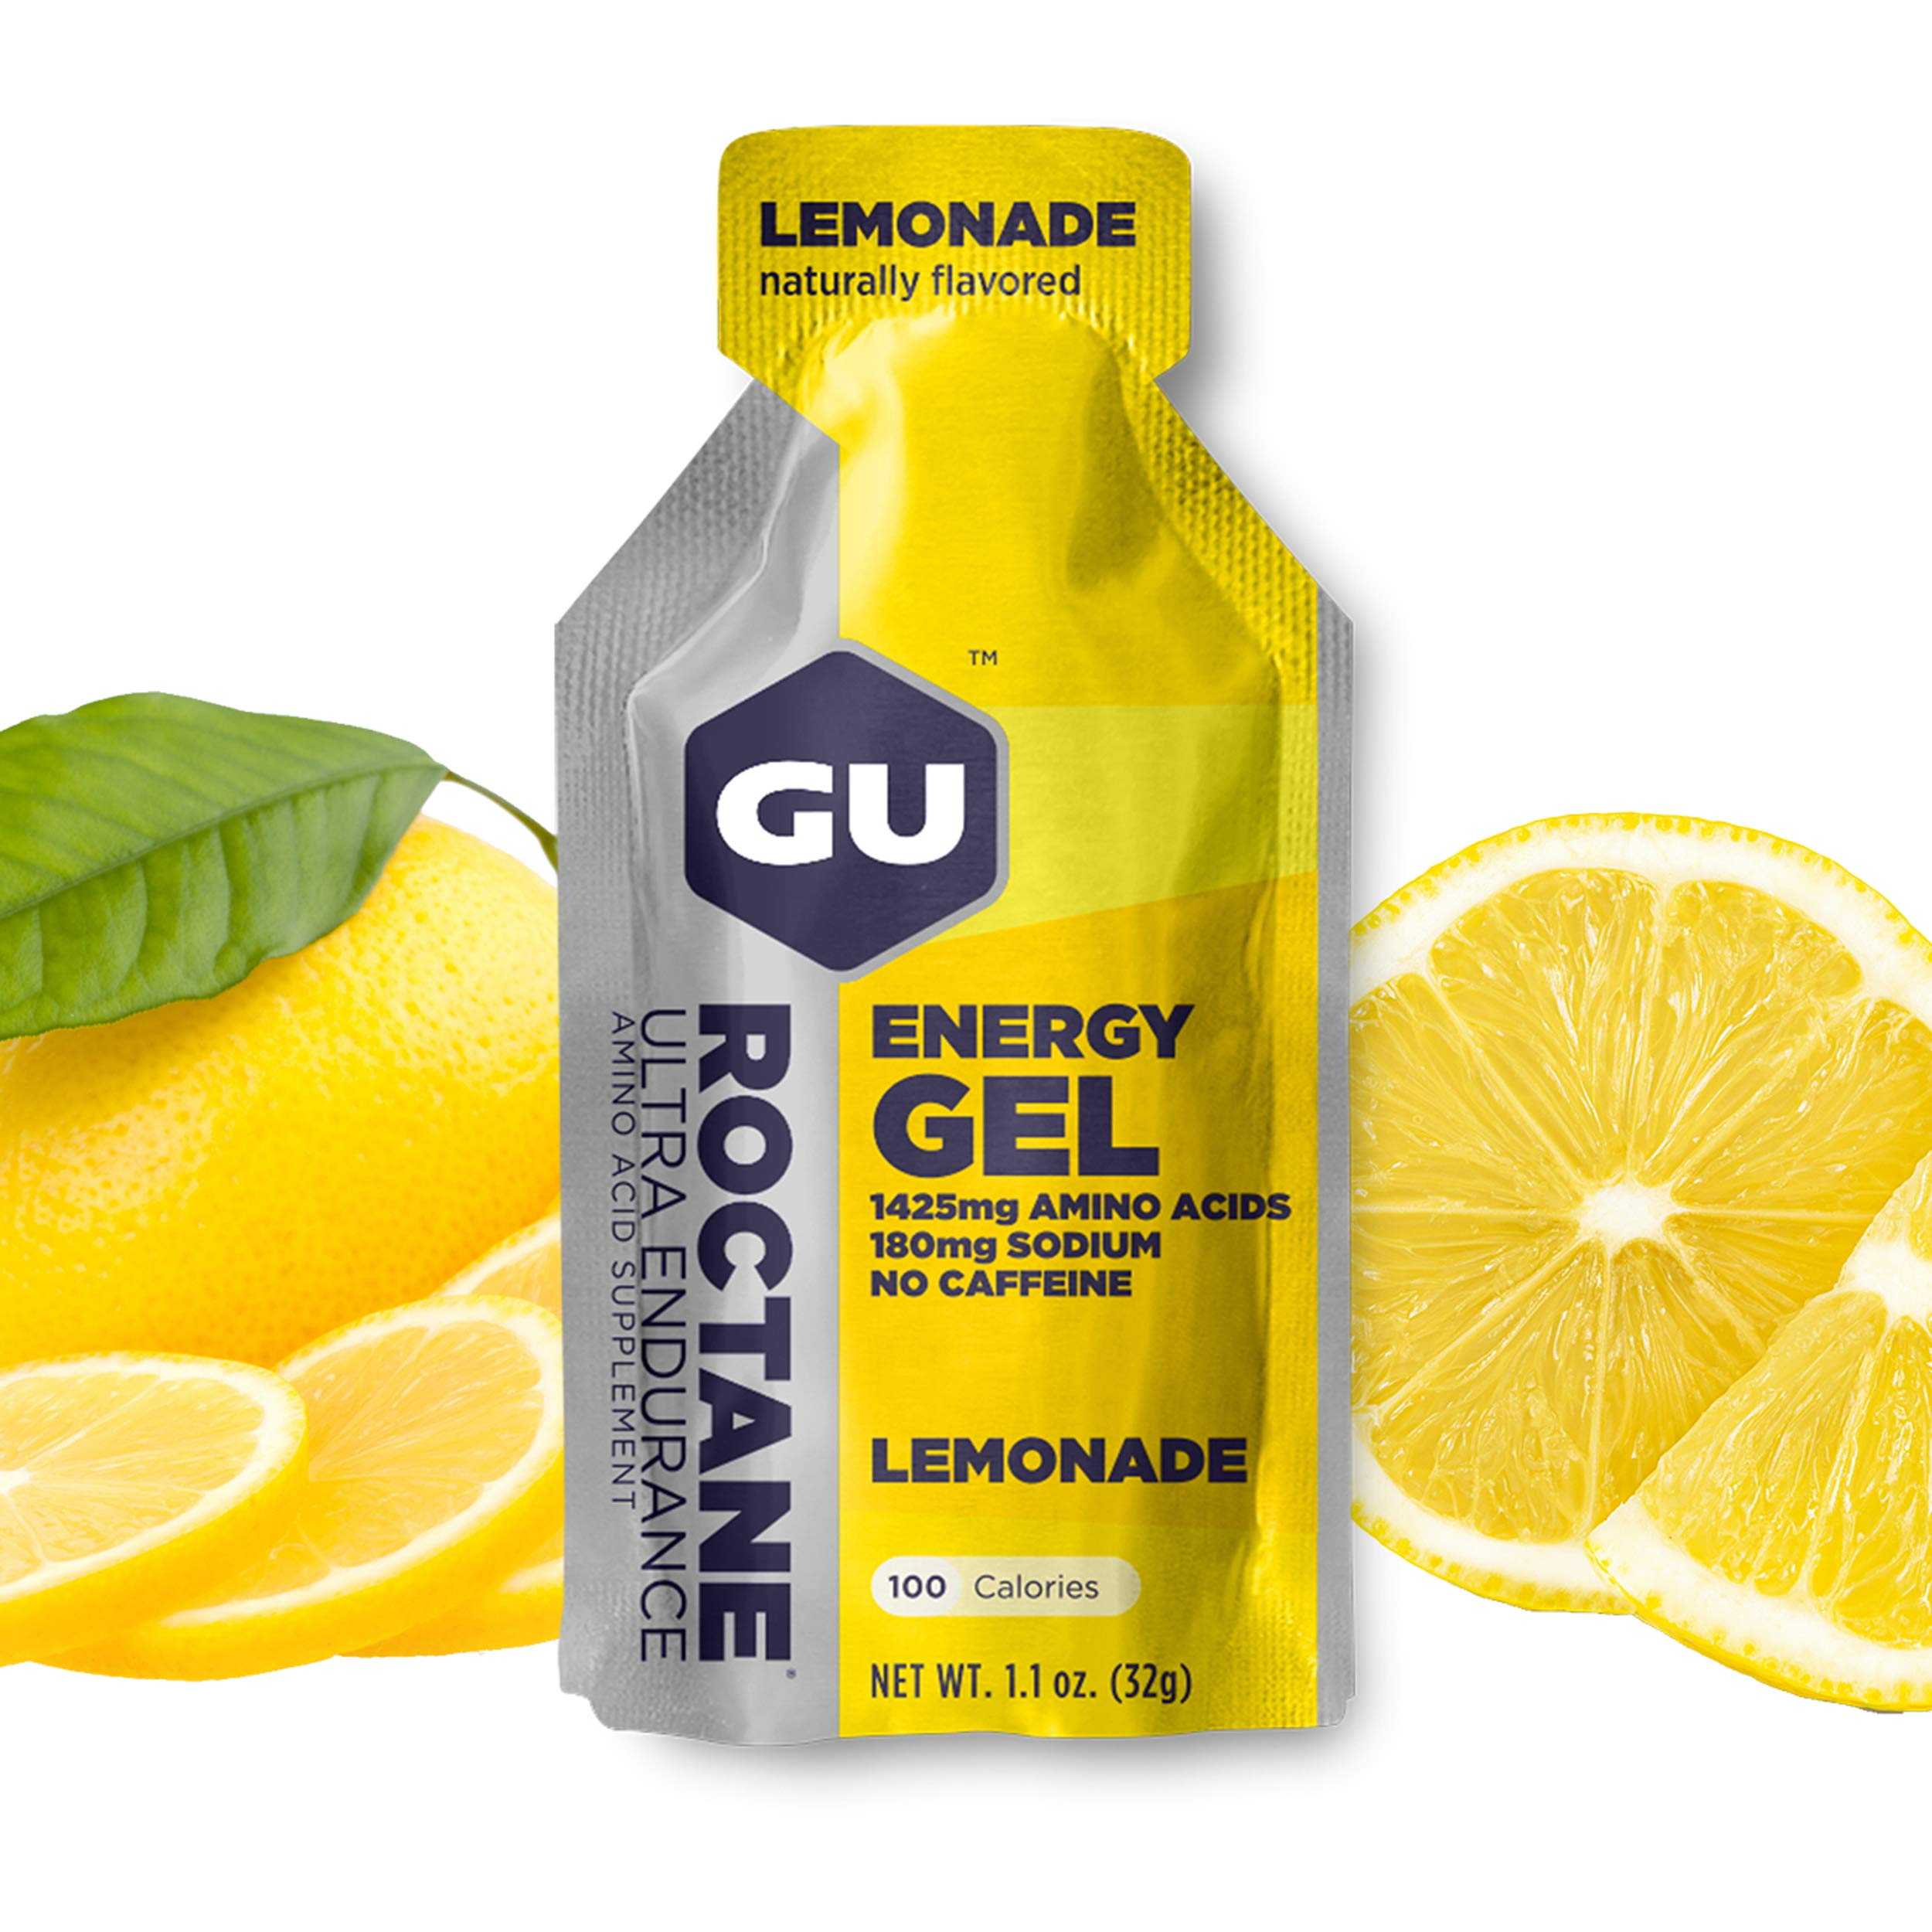 GU Roctane Ultra Endurance Energy Gel, Lemonade, 8 Count